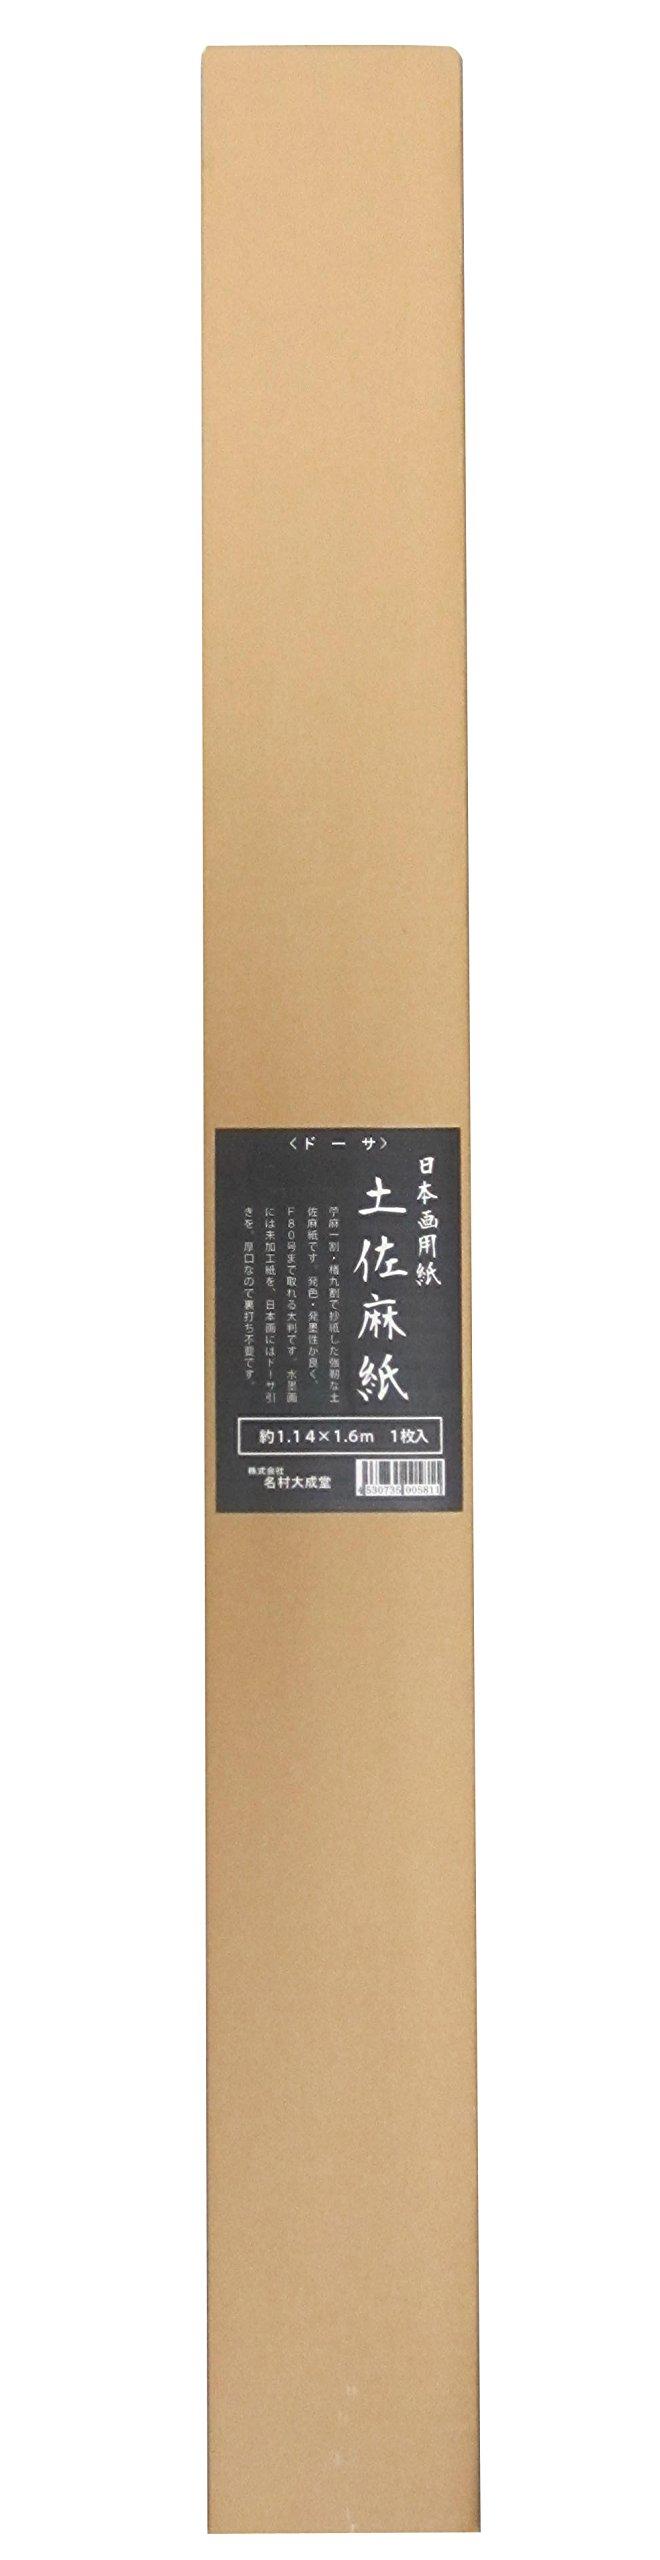 Japanese paper roll Miyabikokoro 404 Tosa hemp paper Tokuban dosa enter one